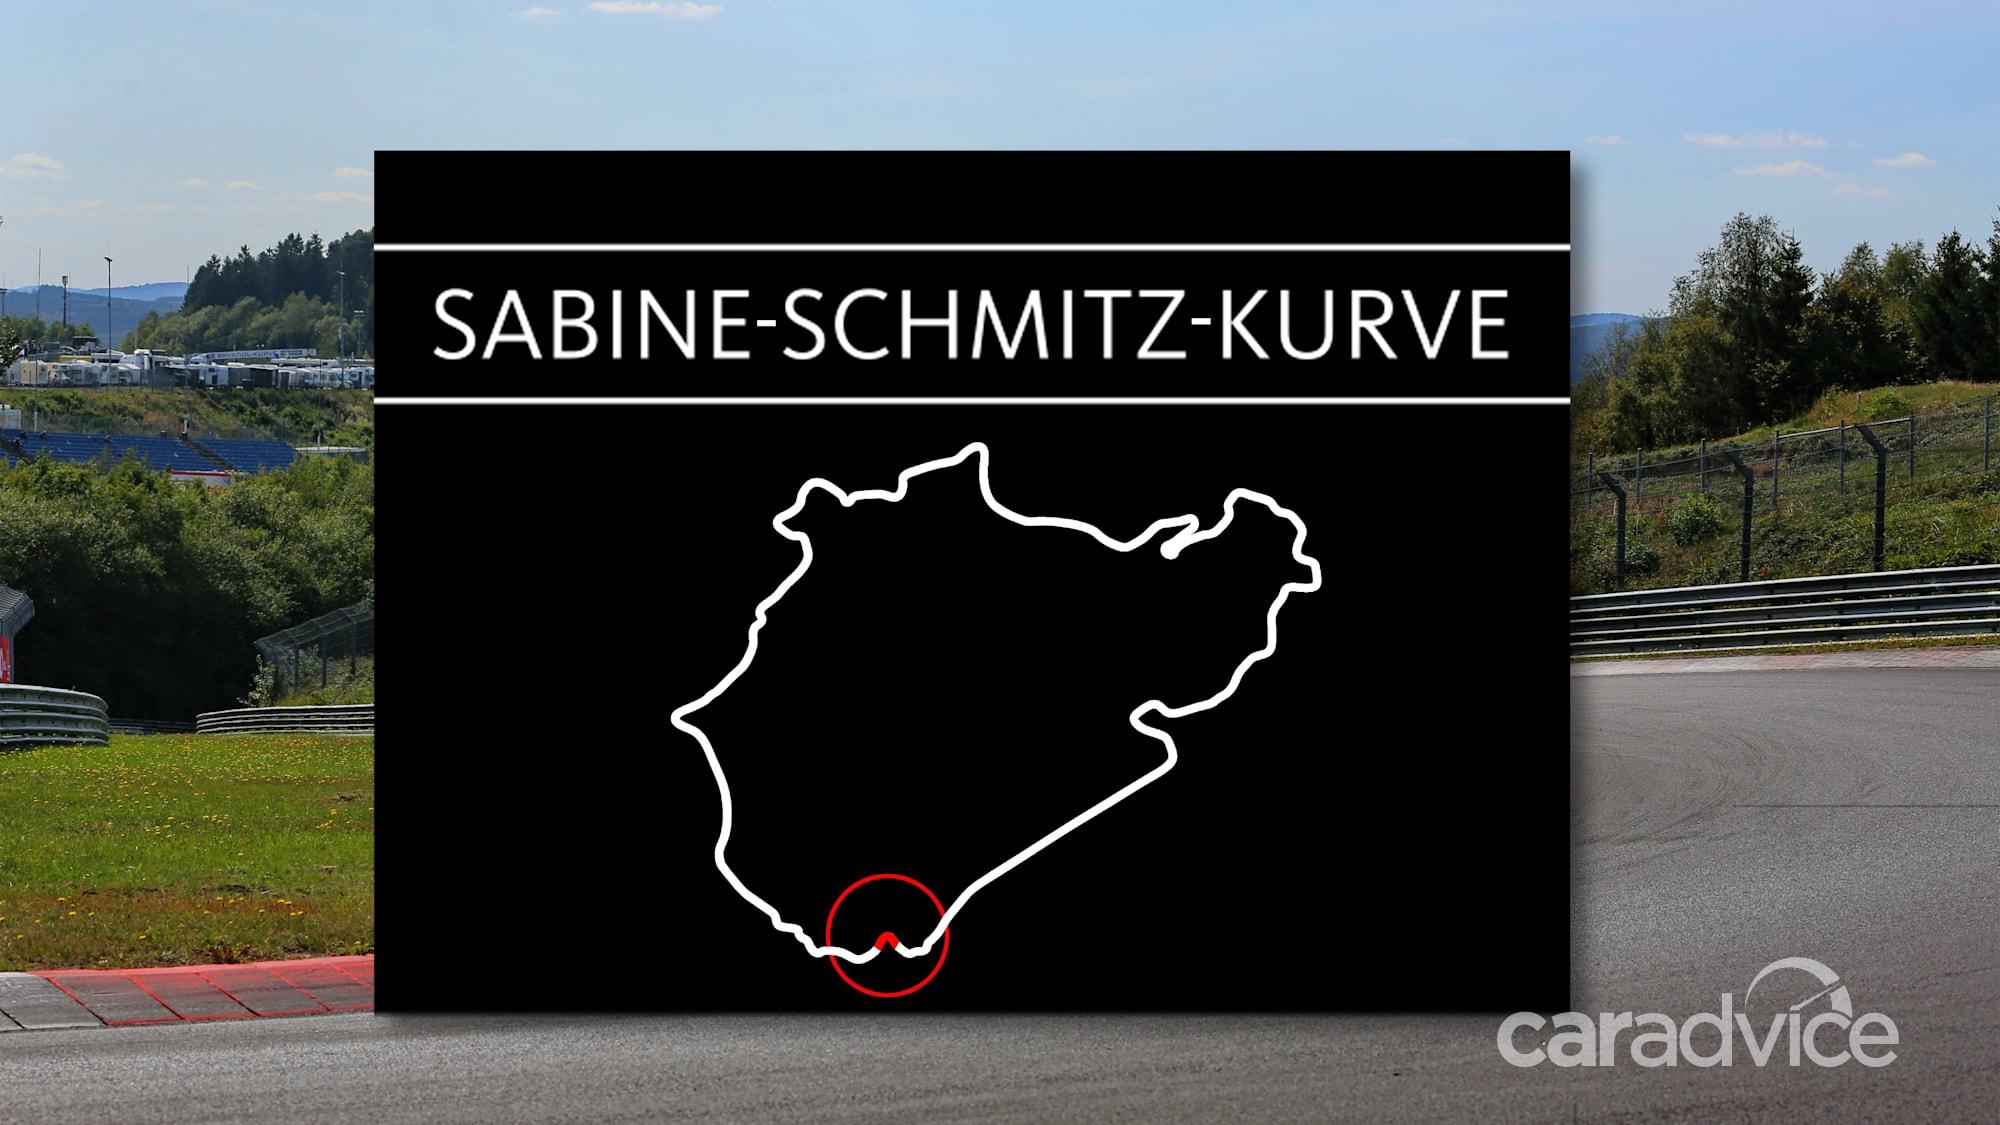 Angolo dei nomi dell'autodromo tedesco del Nürburgring dopo la compianta Sabine Schmitz - 2 di 2